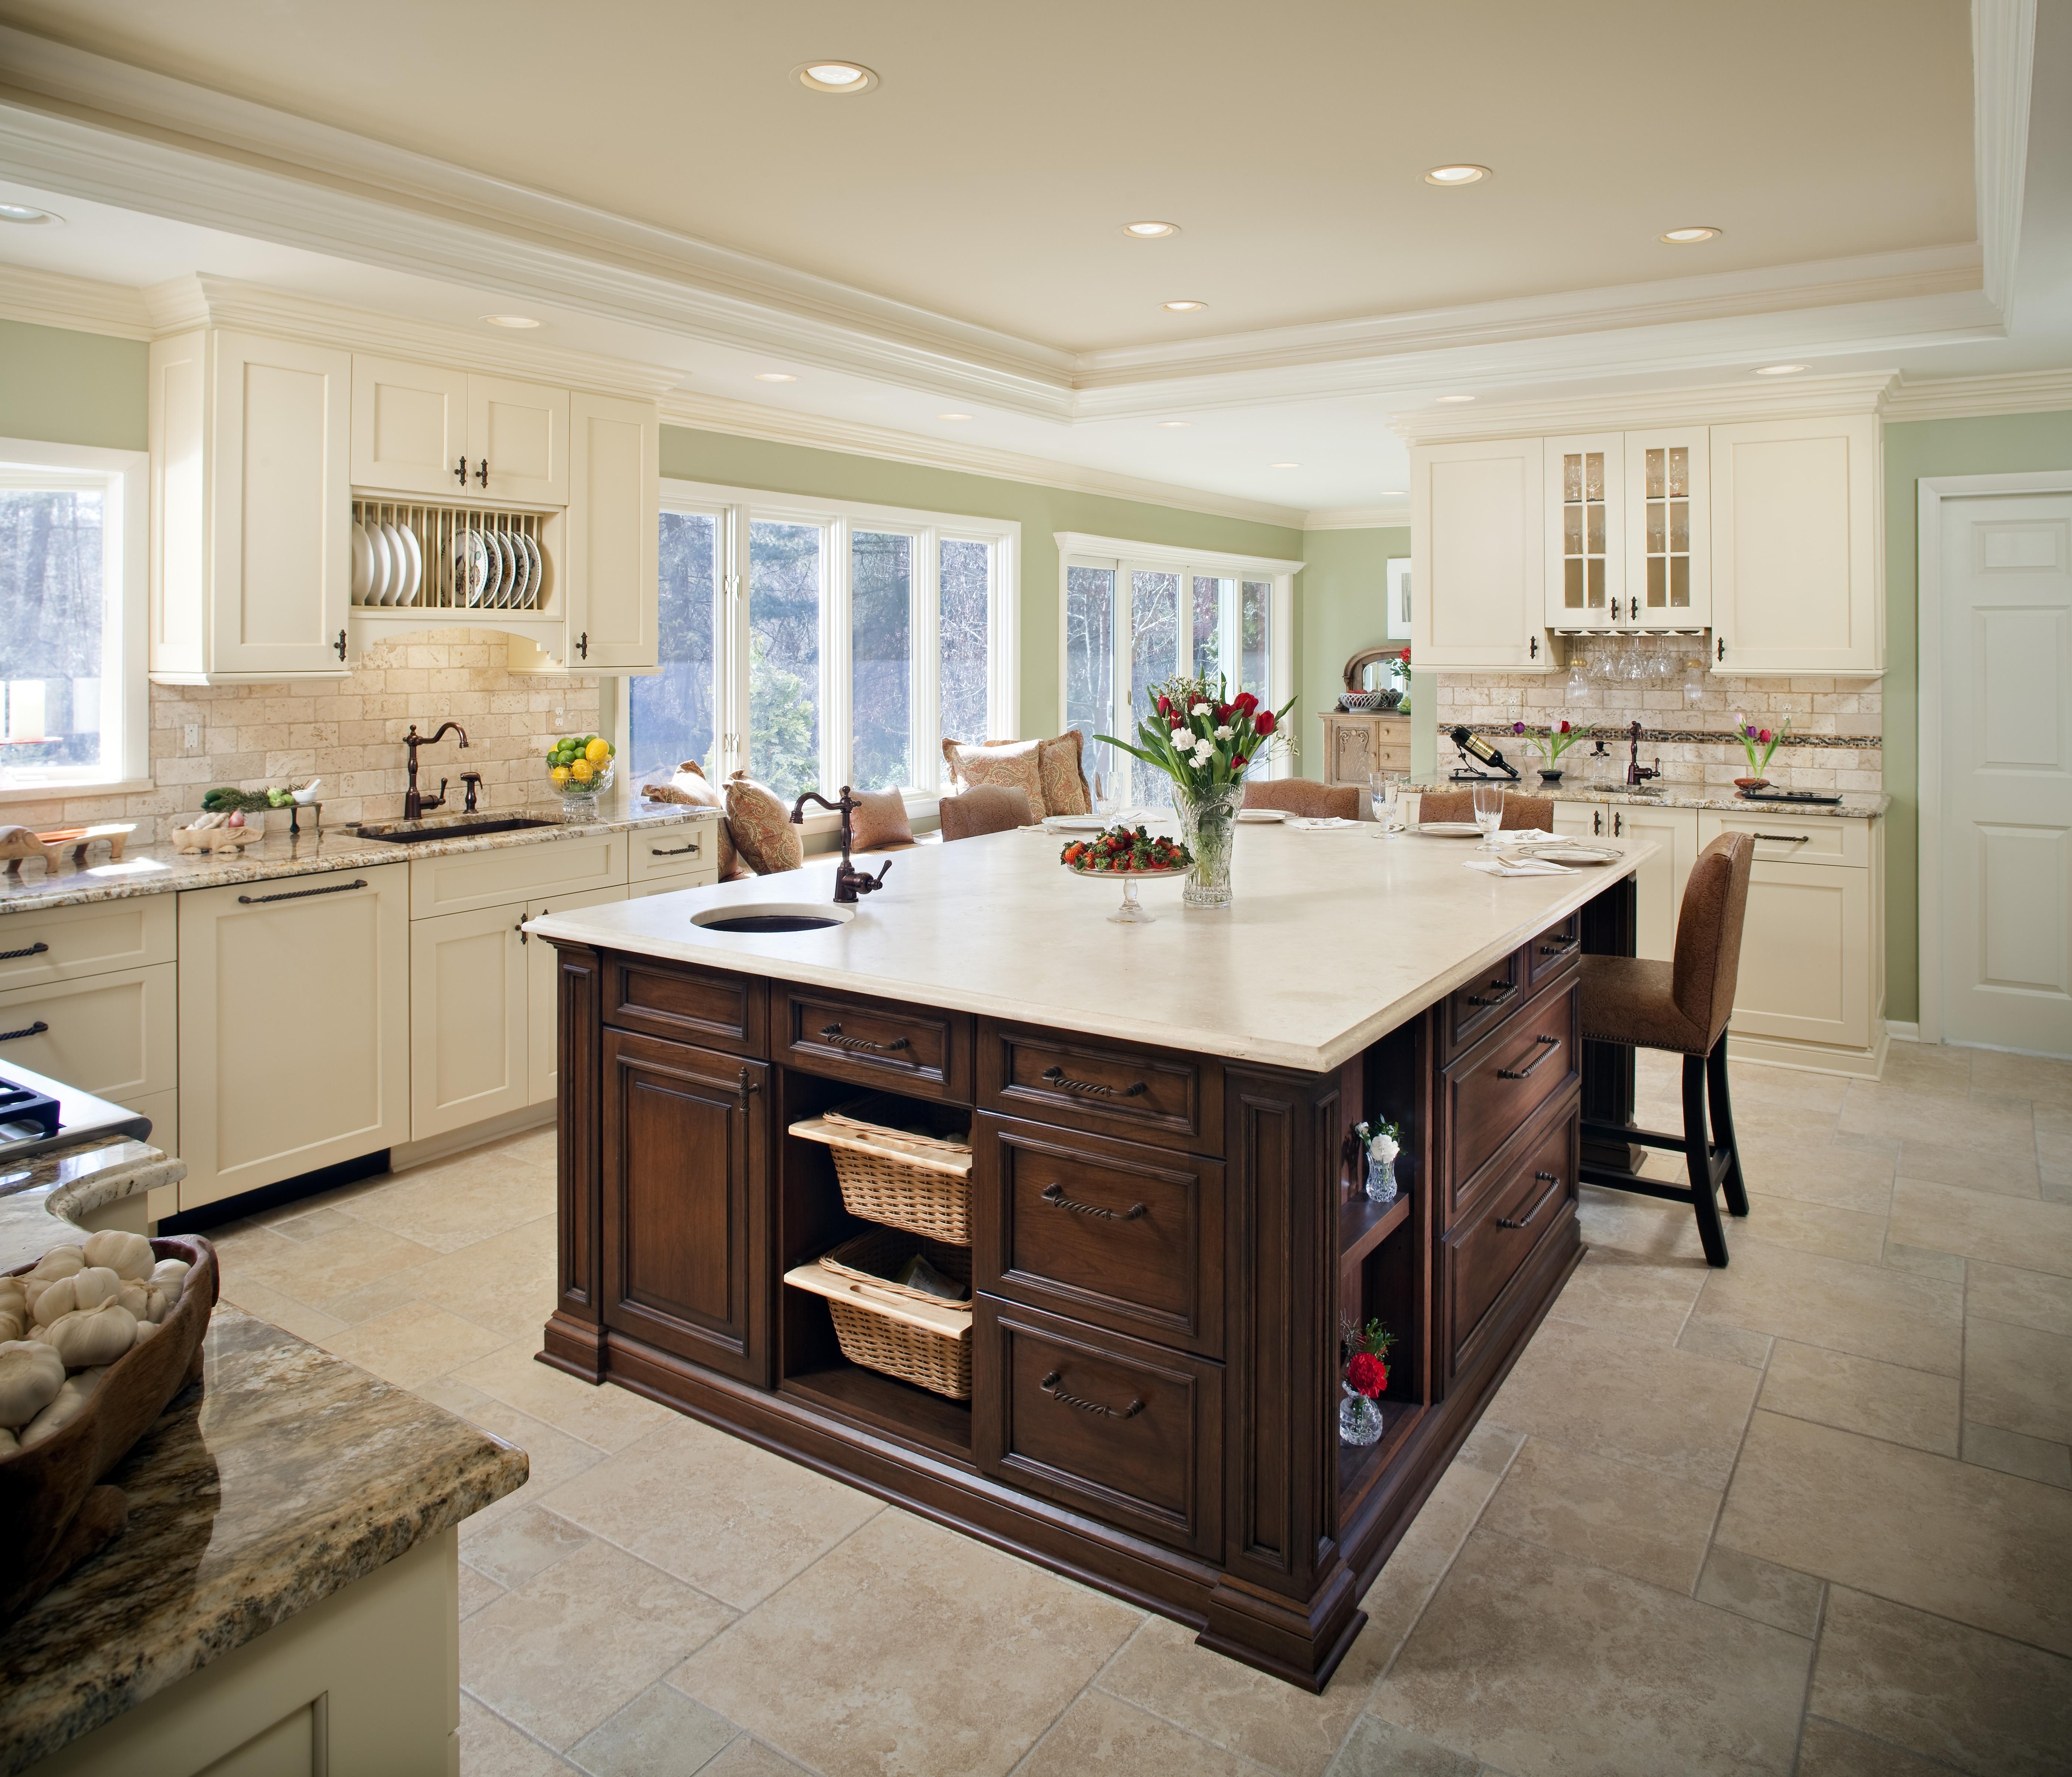 Welcome To Ashley's Kitchen & Bath Design Studio